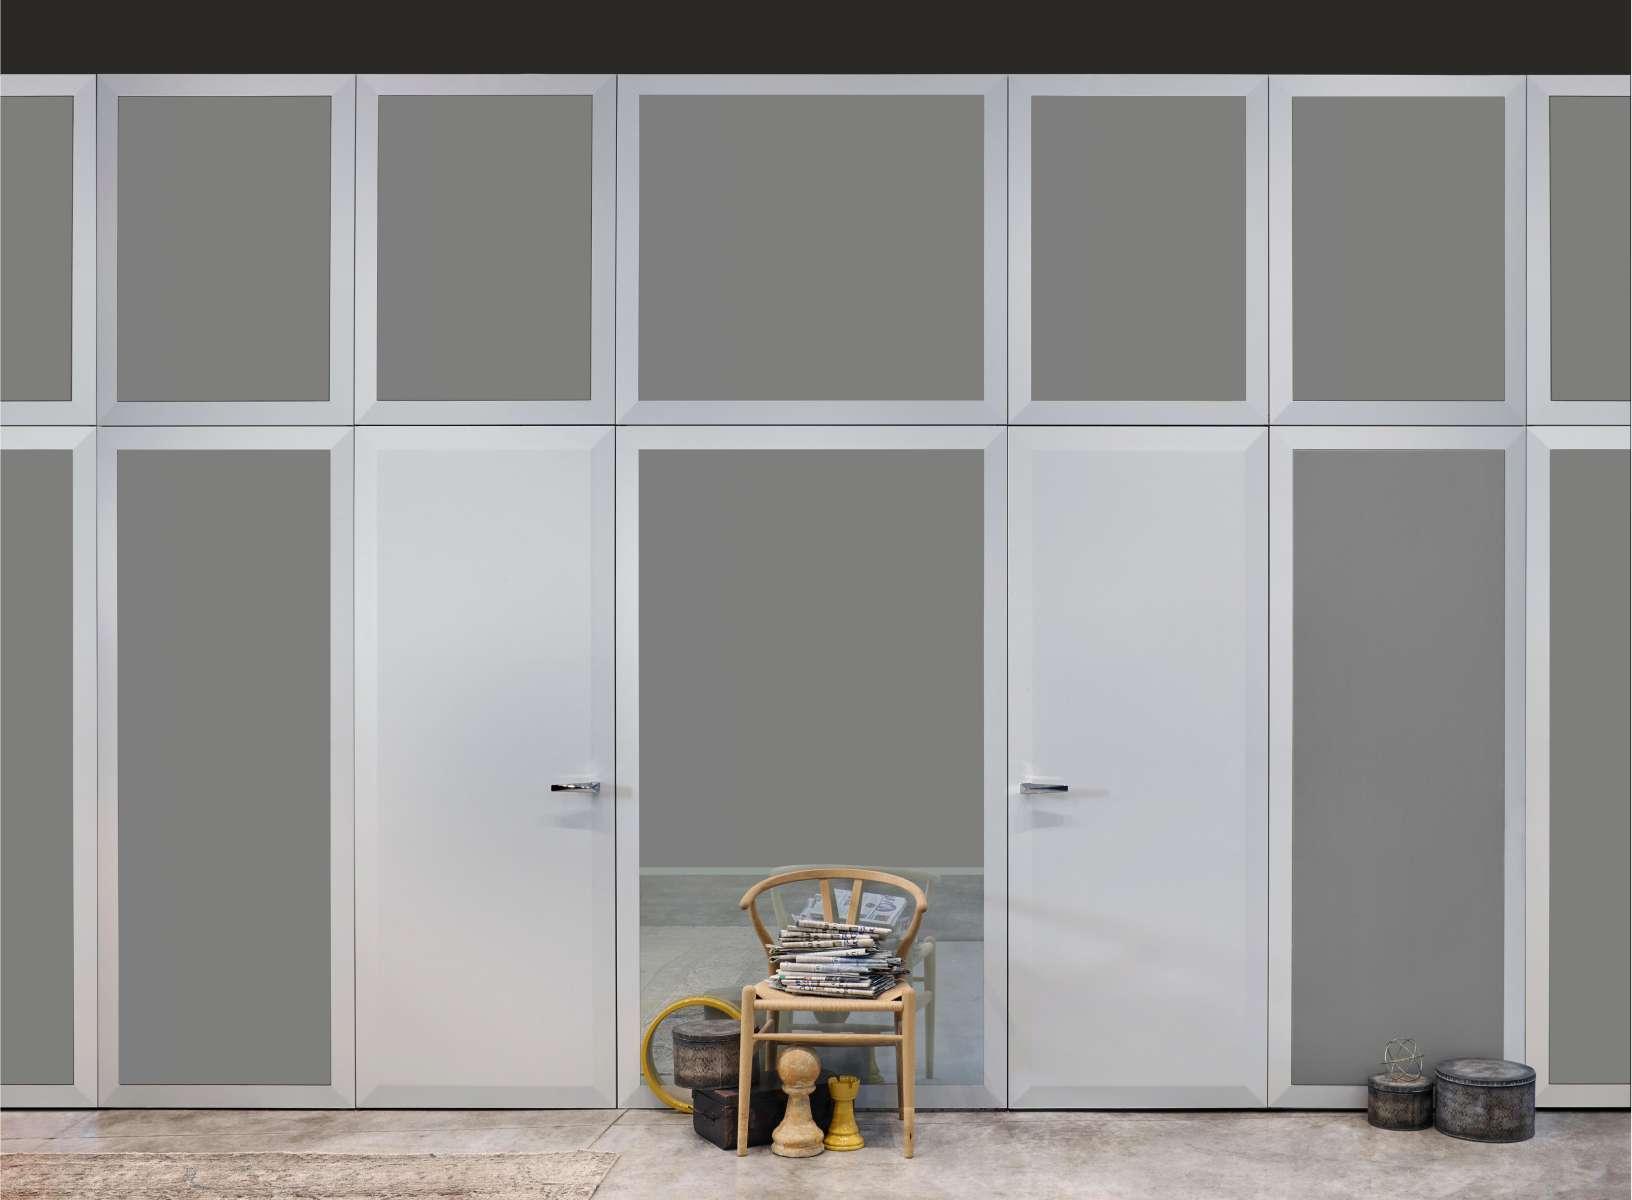 Studio Marco Piva – Product design – 335